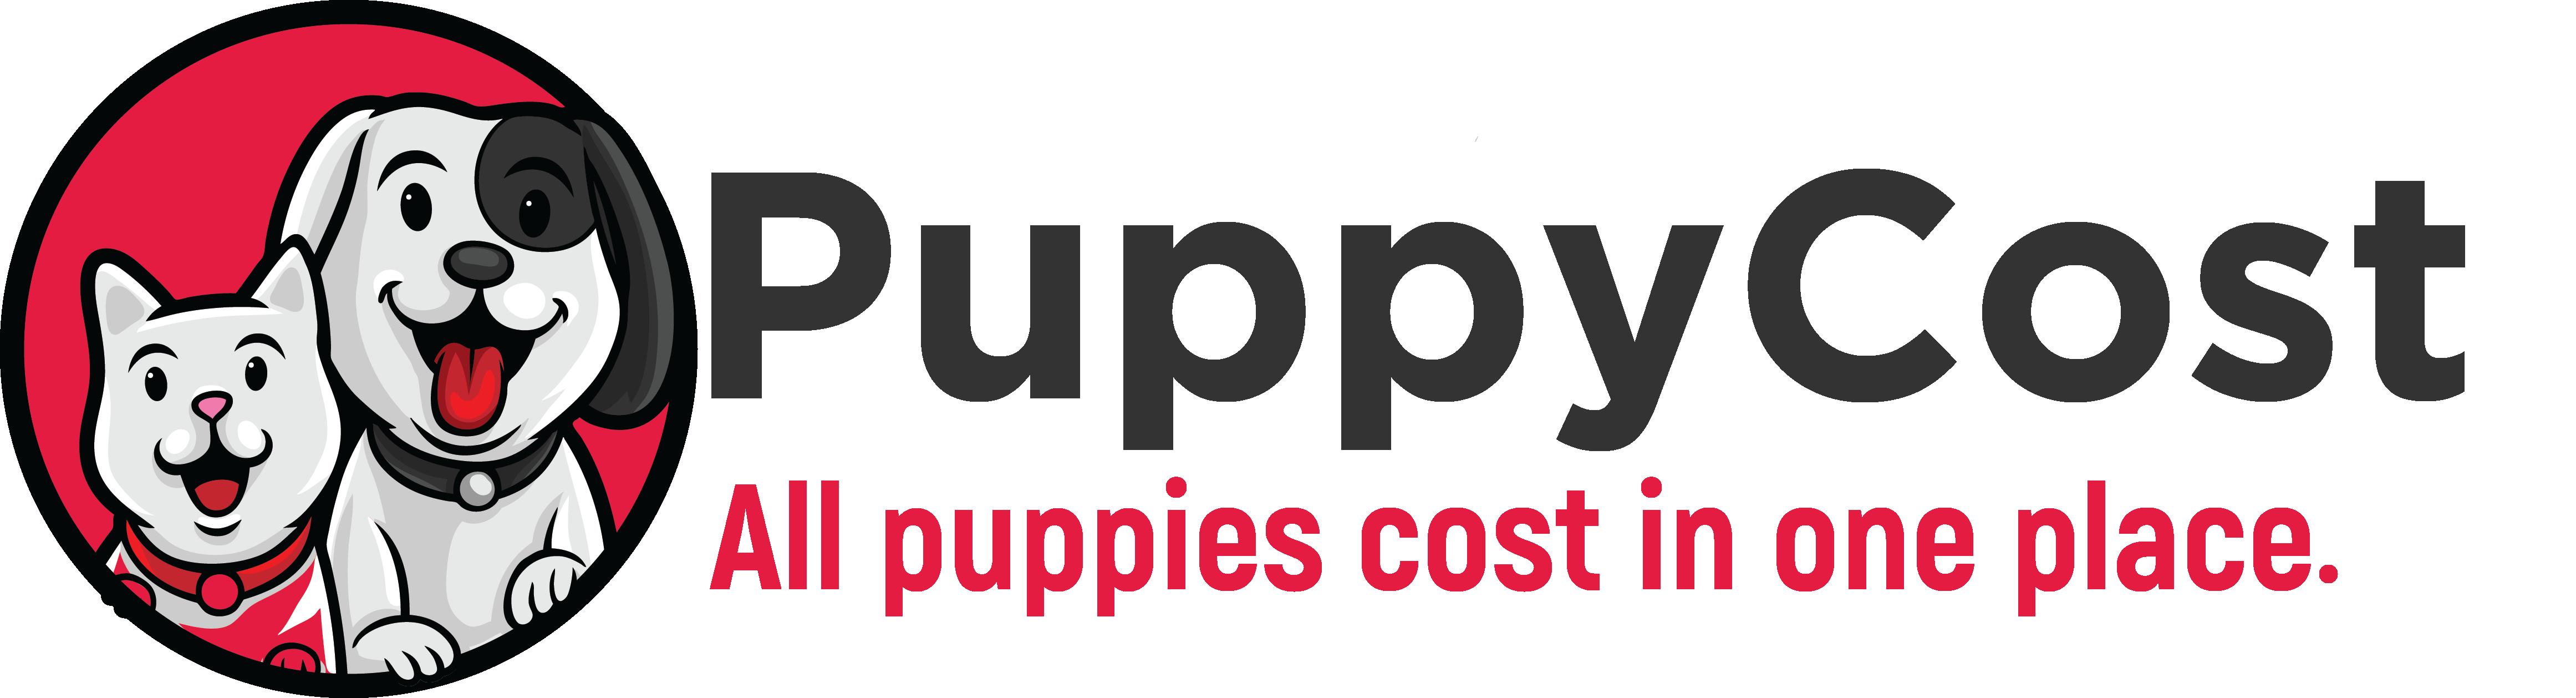 Puppy Cost